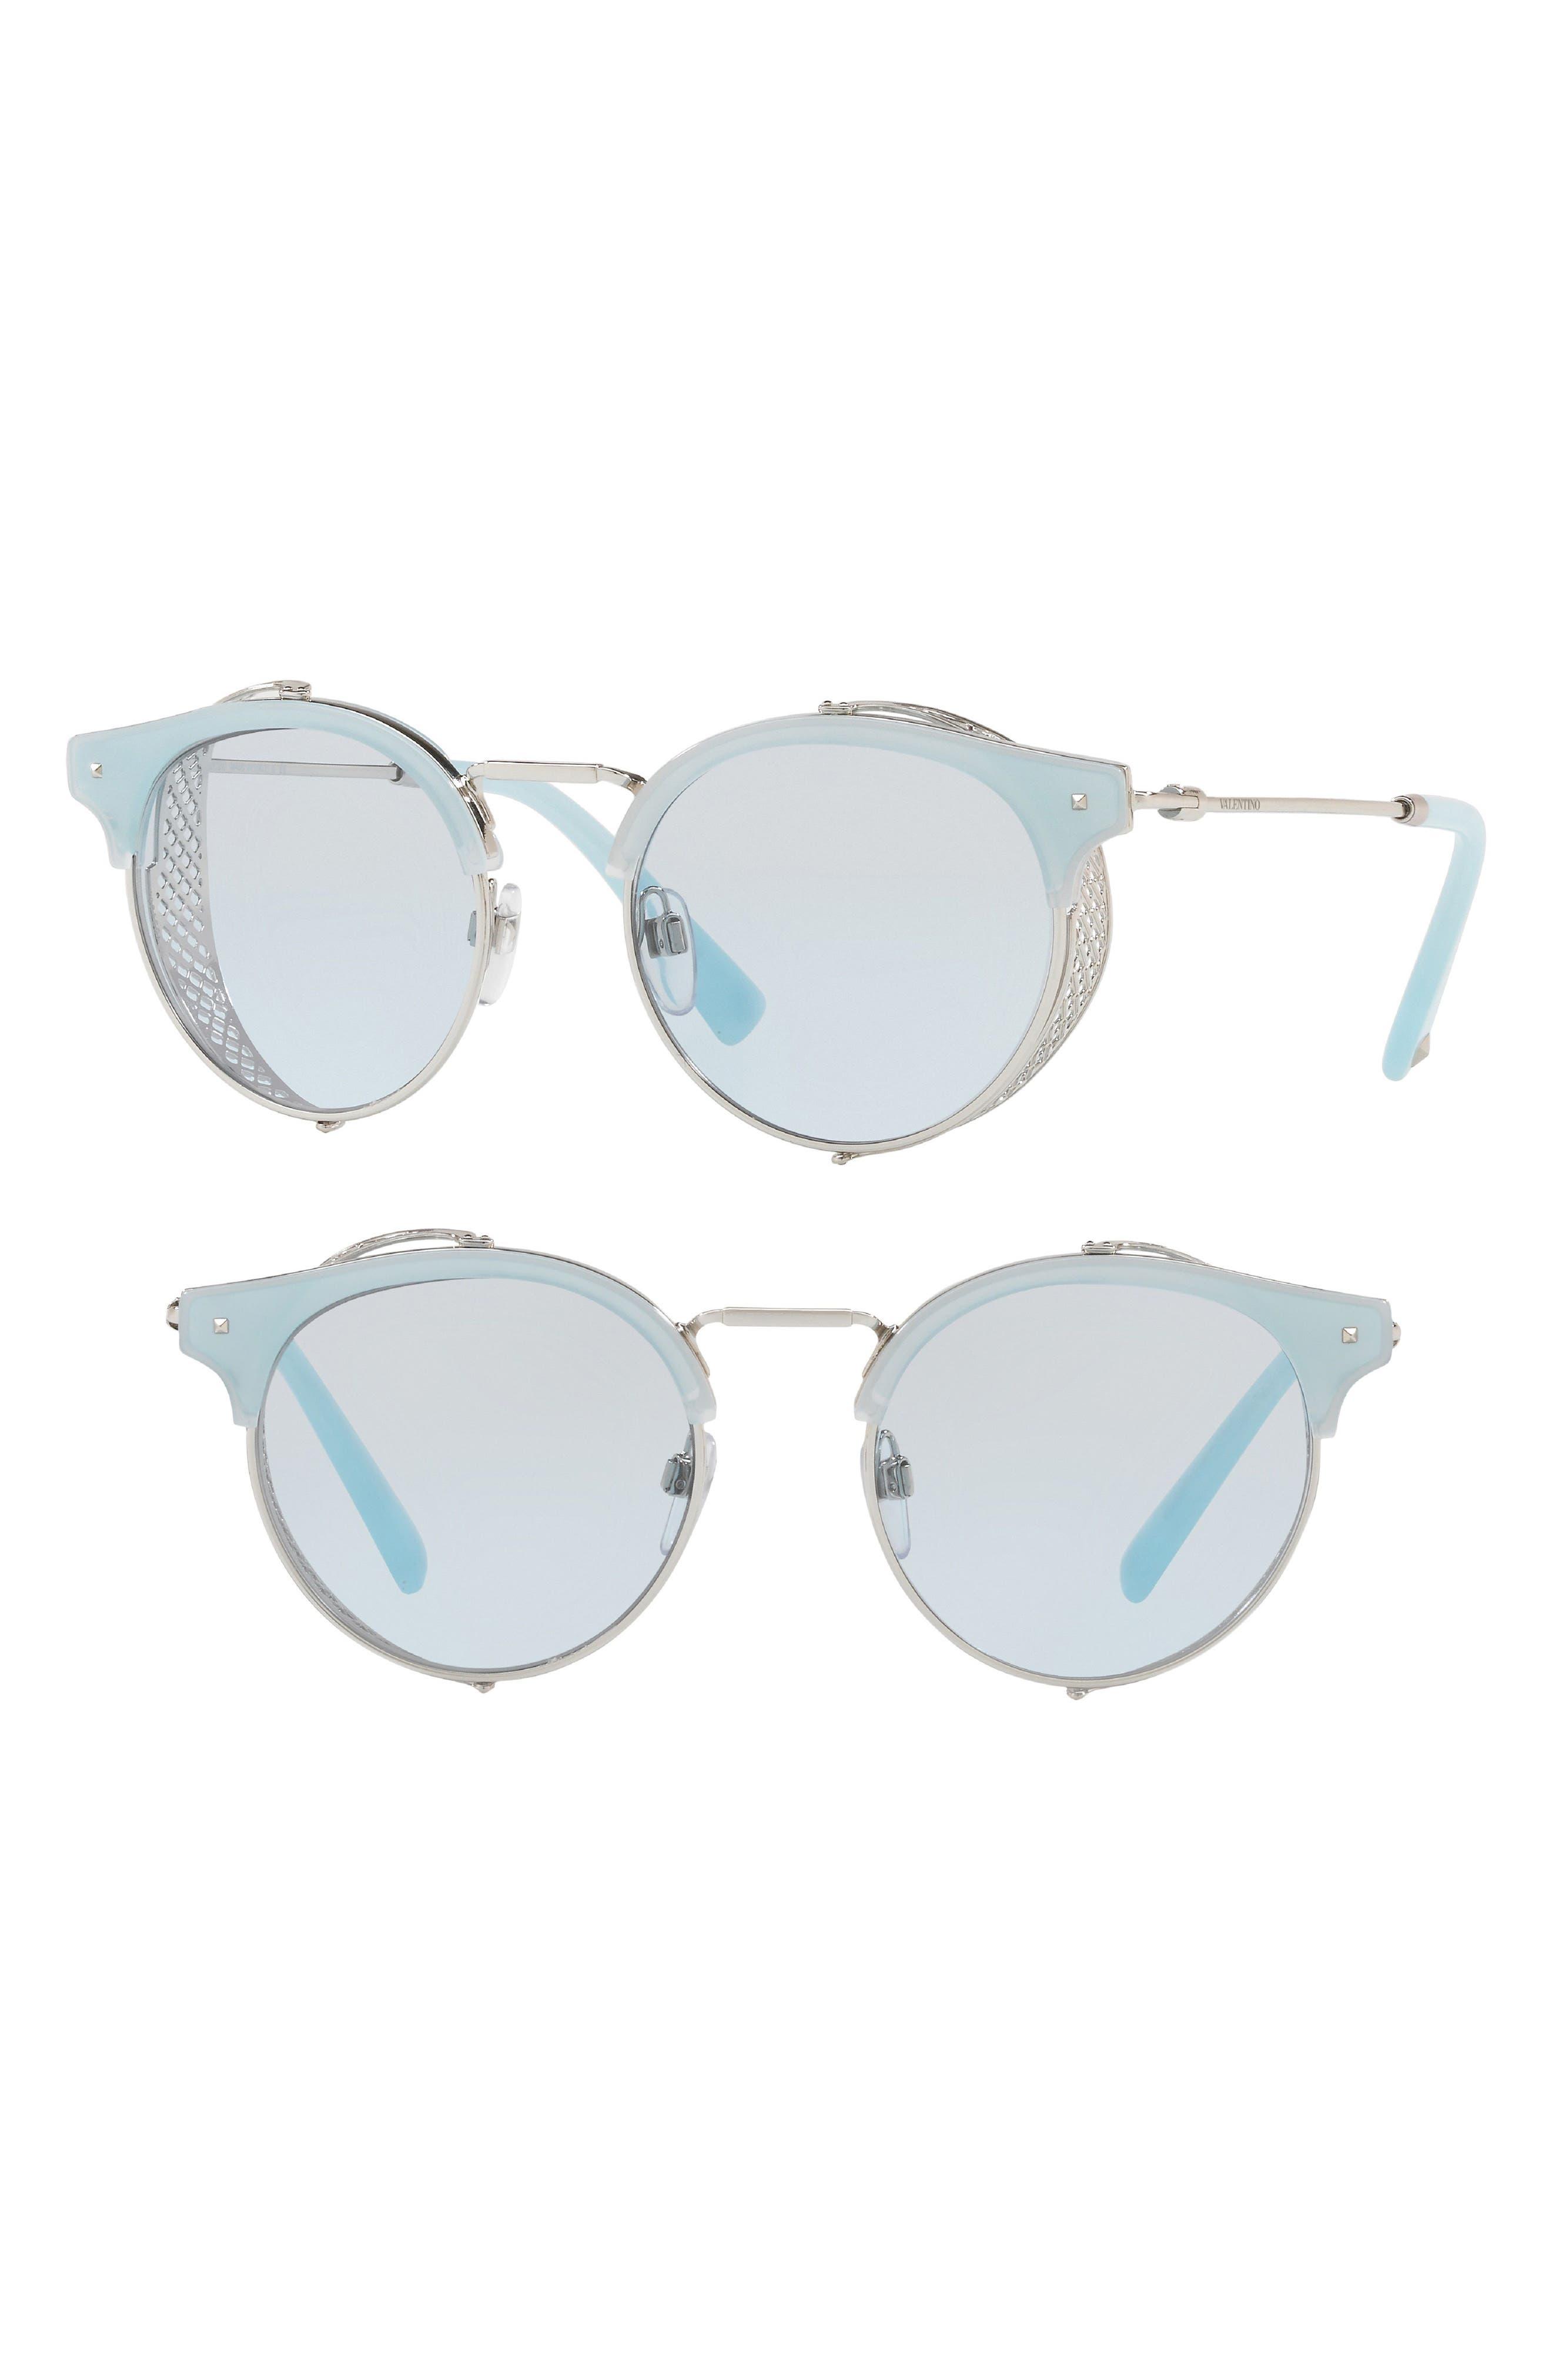 Alternate Image 1 Selected - Valentino 48mm Retro Sunglasses